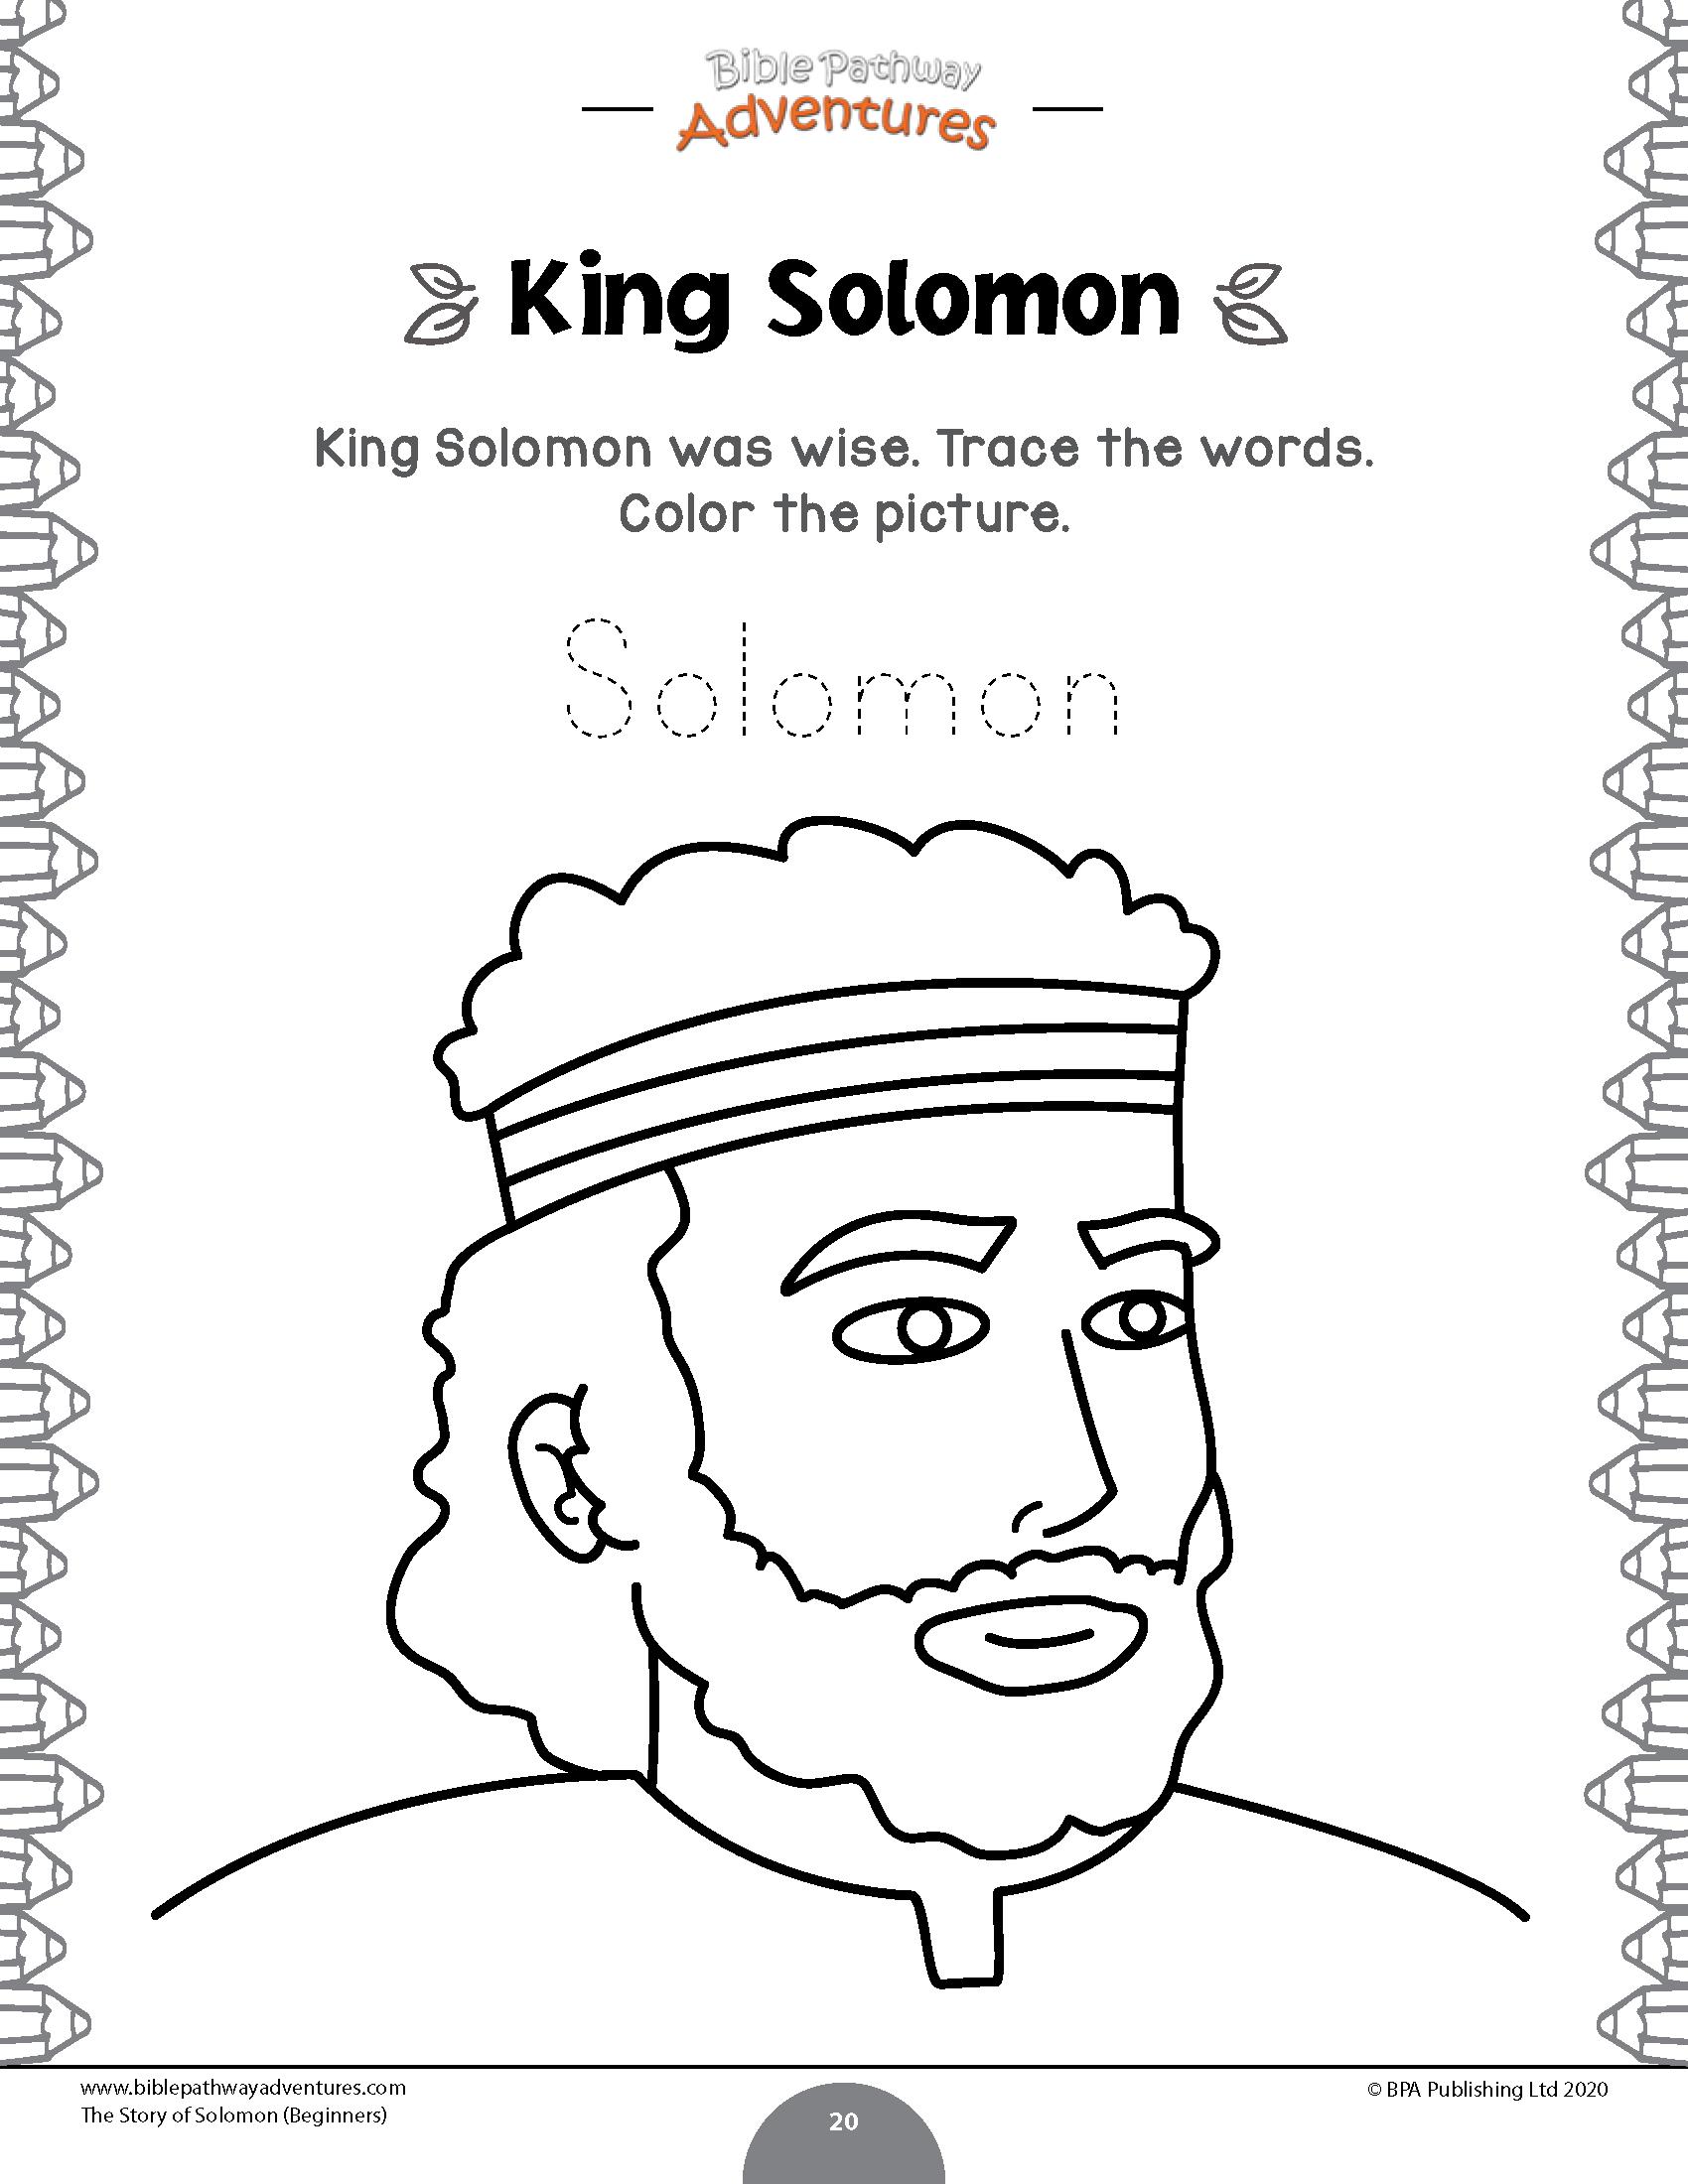 The Story Of Solomon Beginners Bible Pathway Adventures